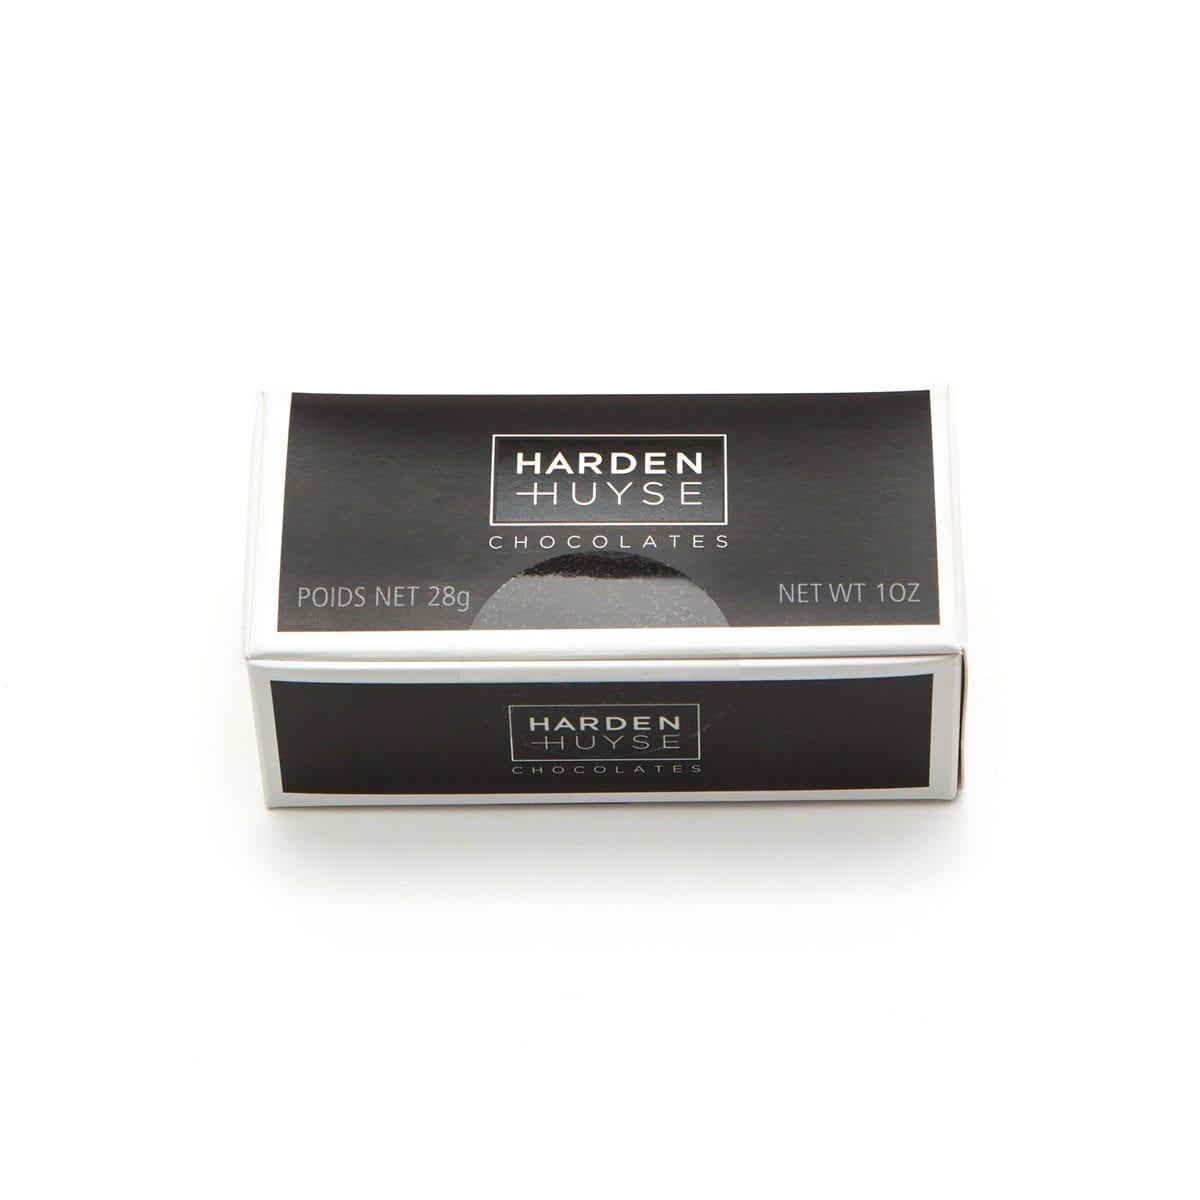 Box of 2 Chocolates